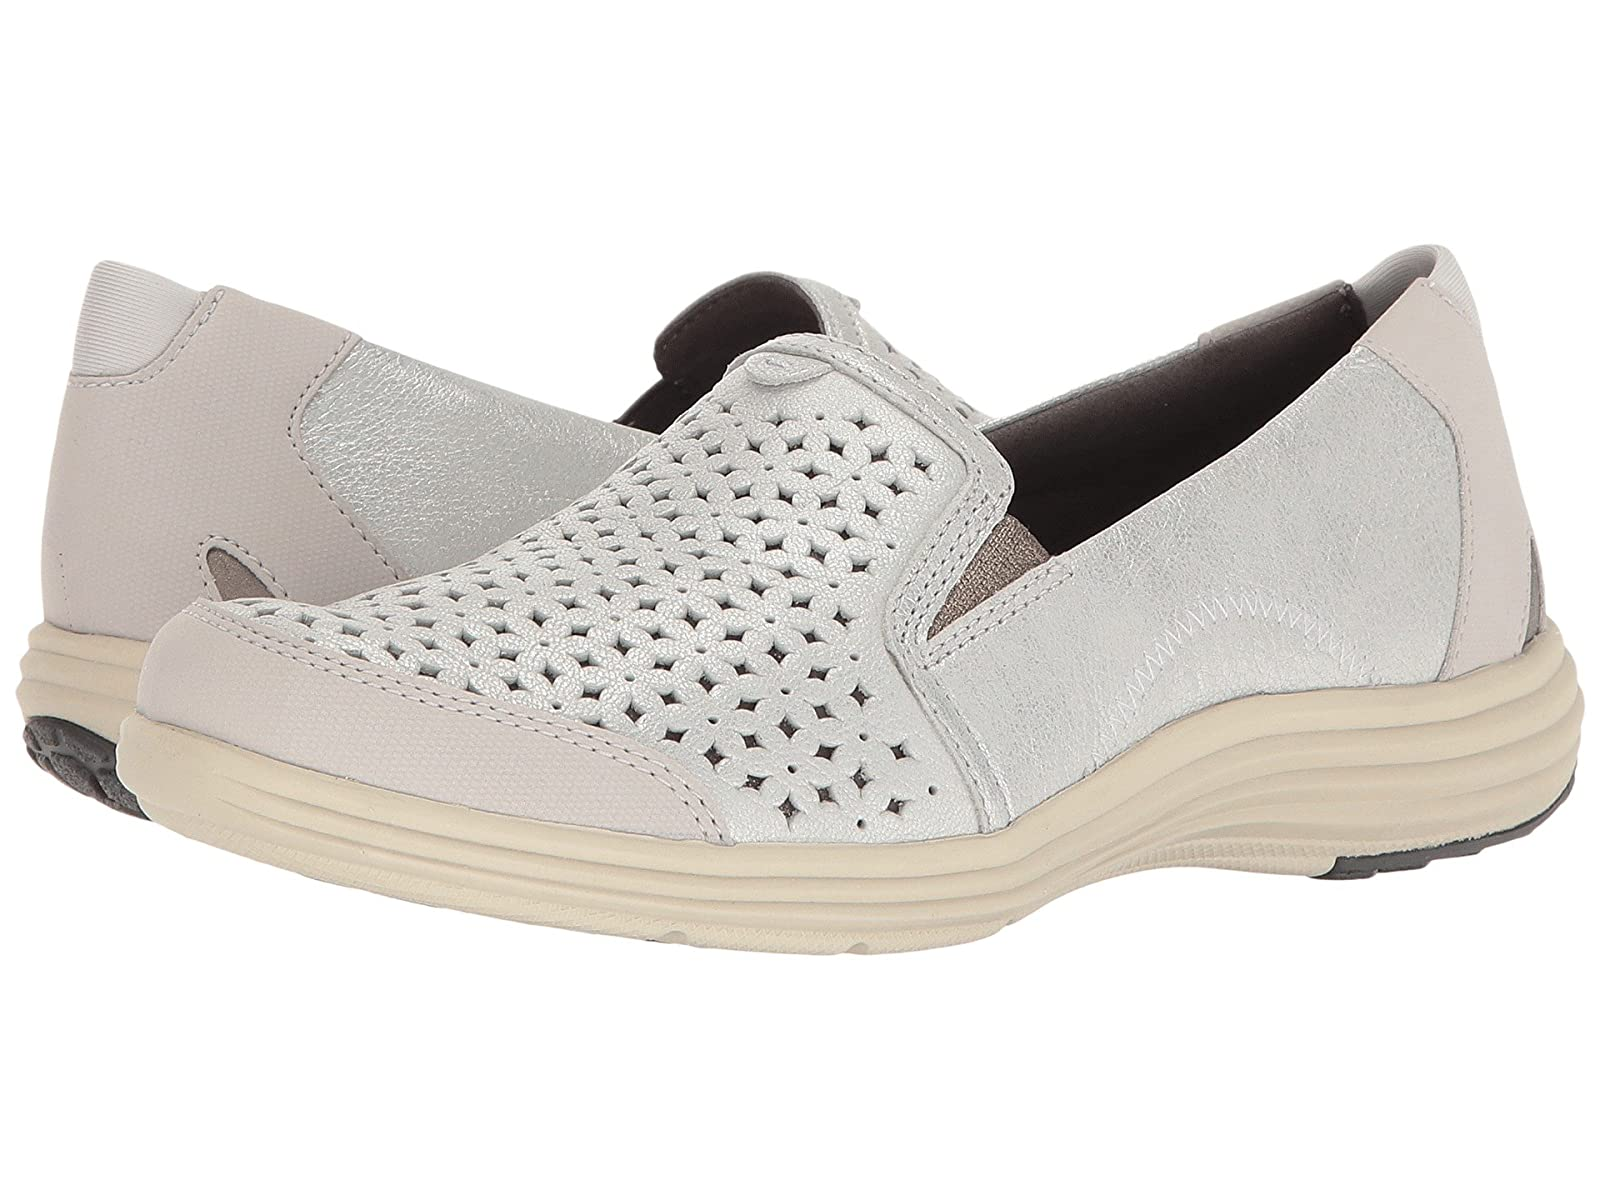 Aravon Bonnie-ARCheap and distinctive eye-catching shoes